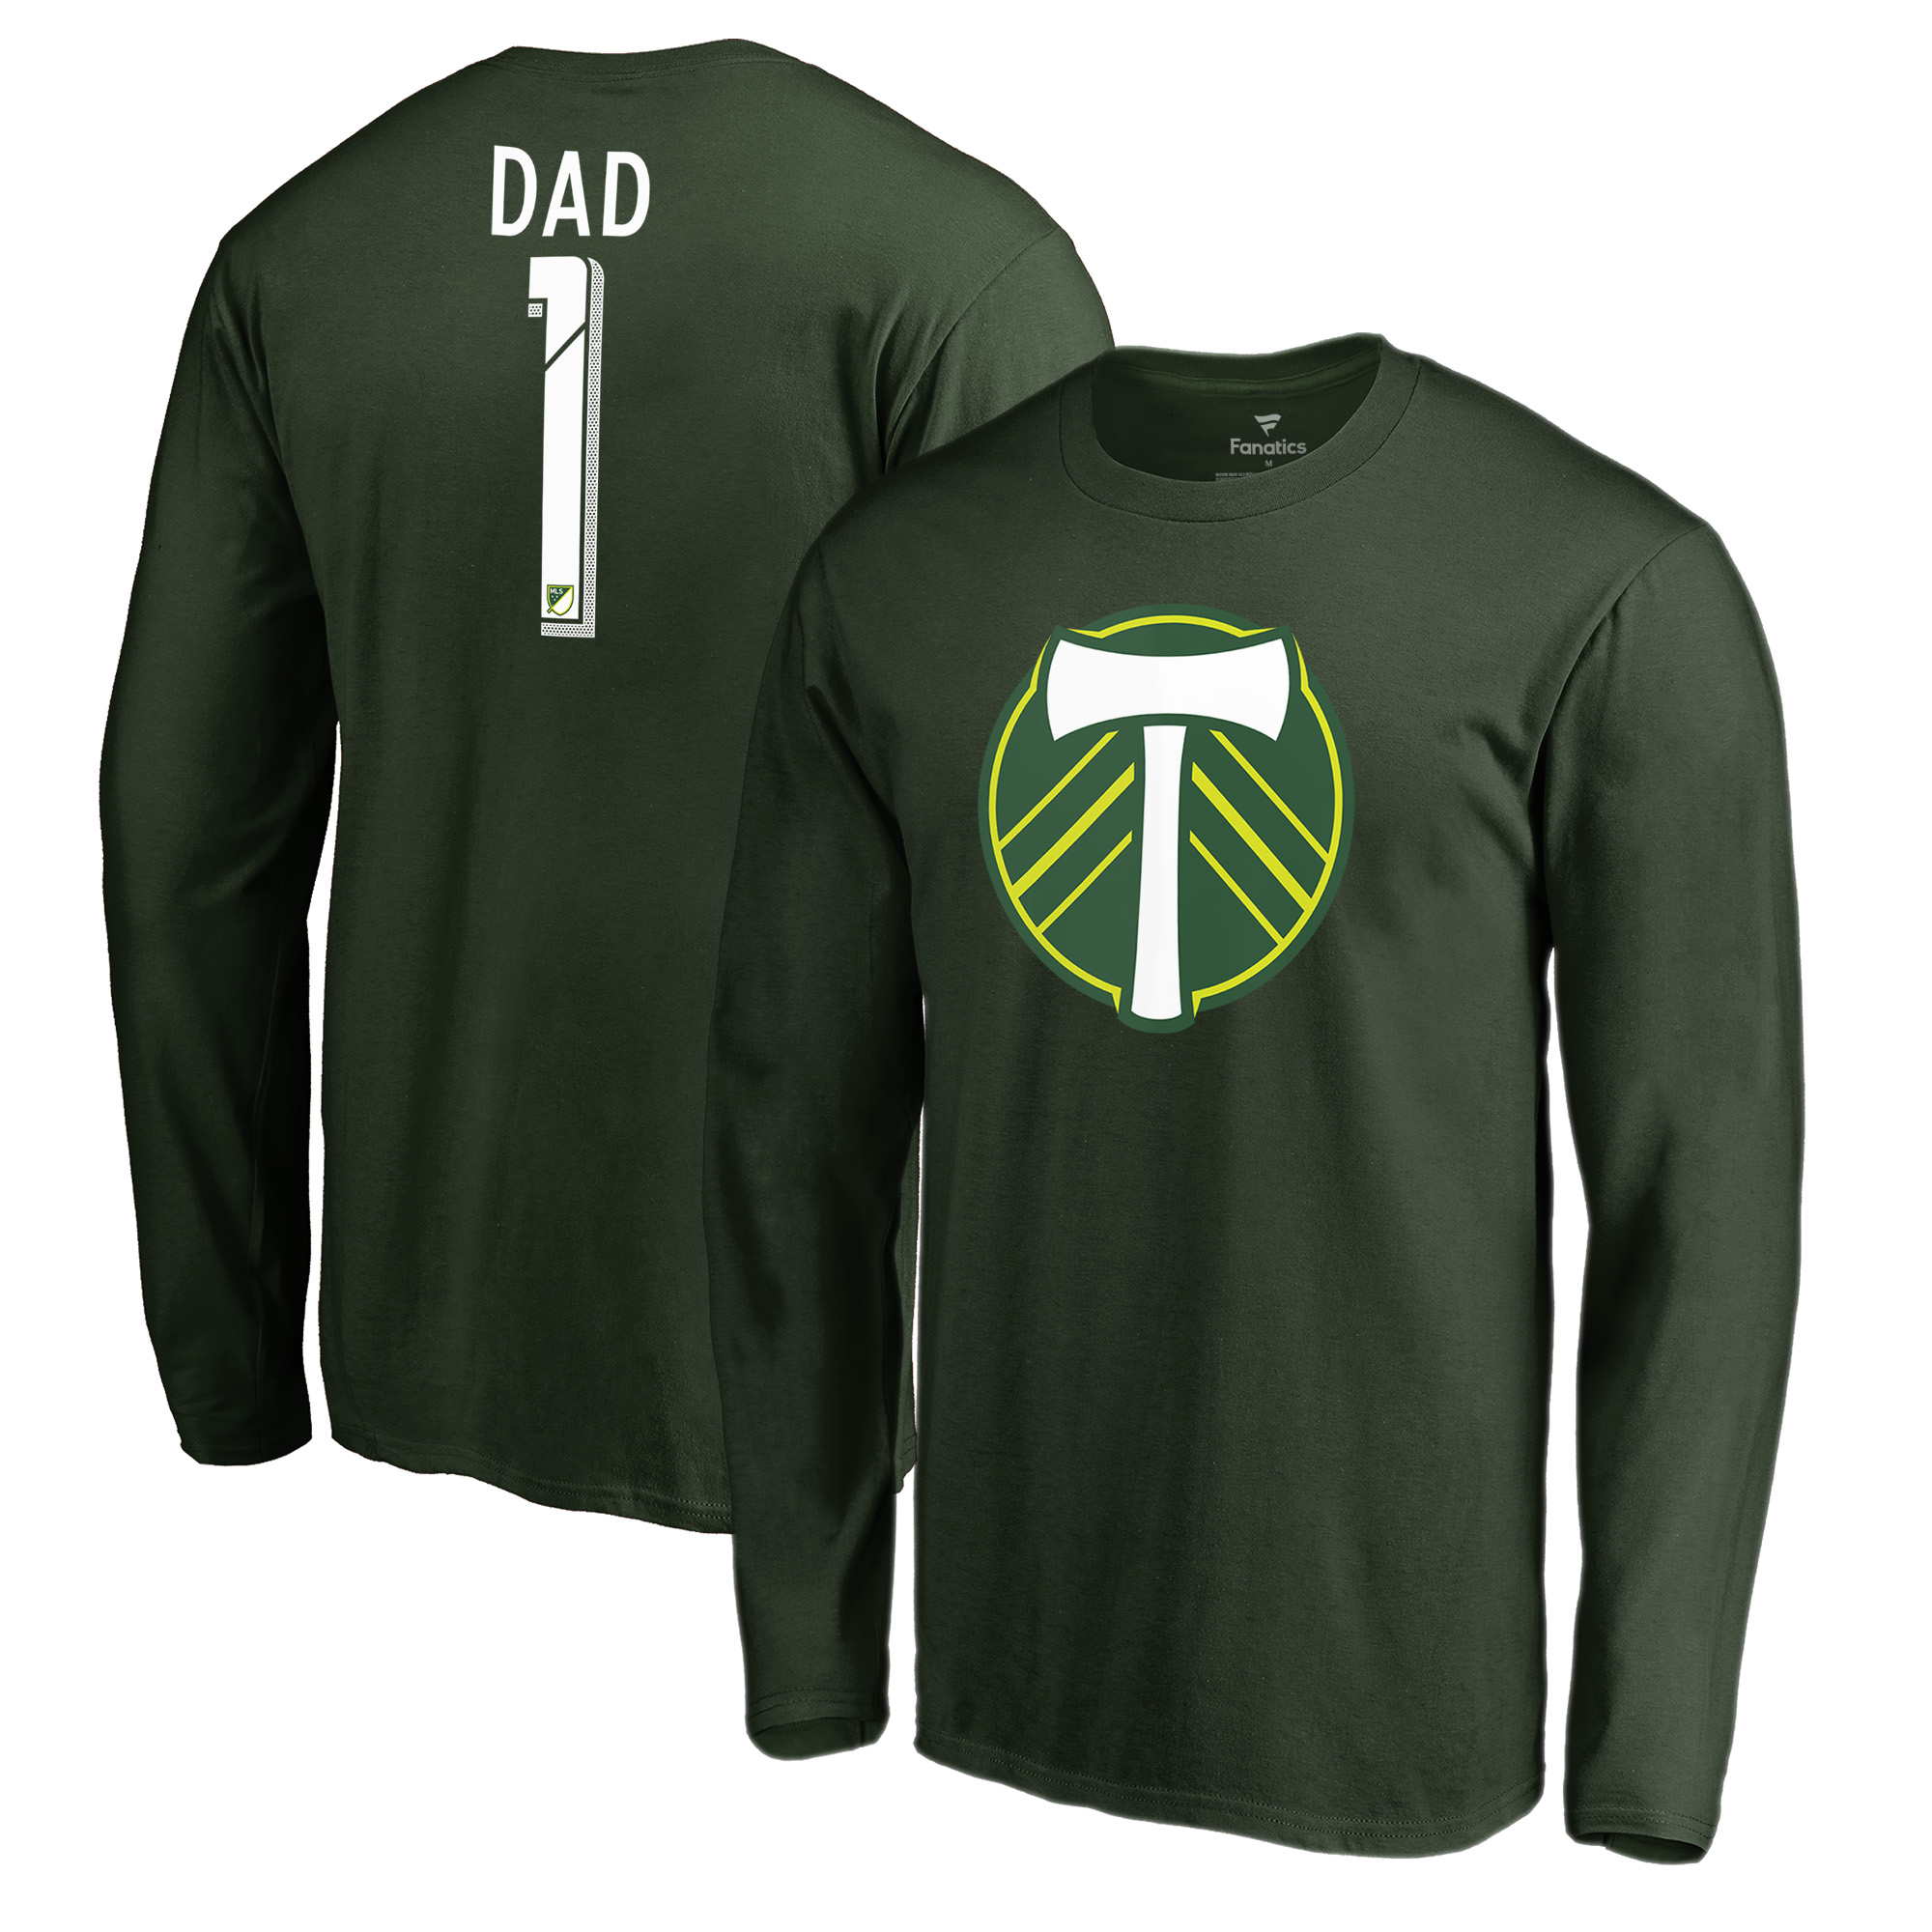 Portland Timbers Fanatics Branded #1 Dad Long Sleeve T-Shirt - Green